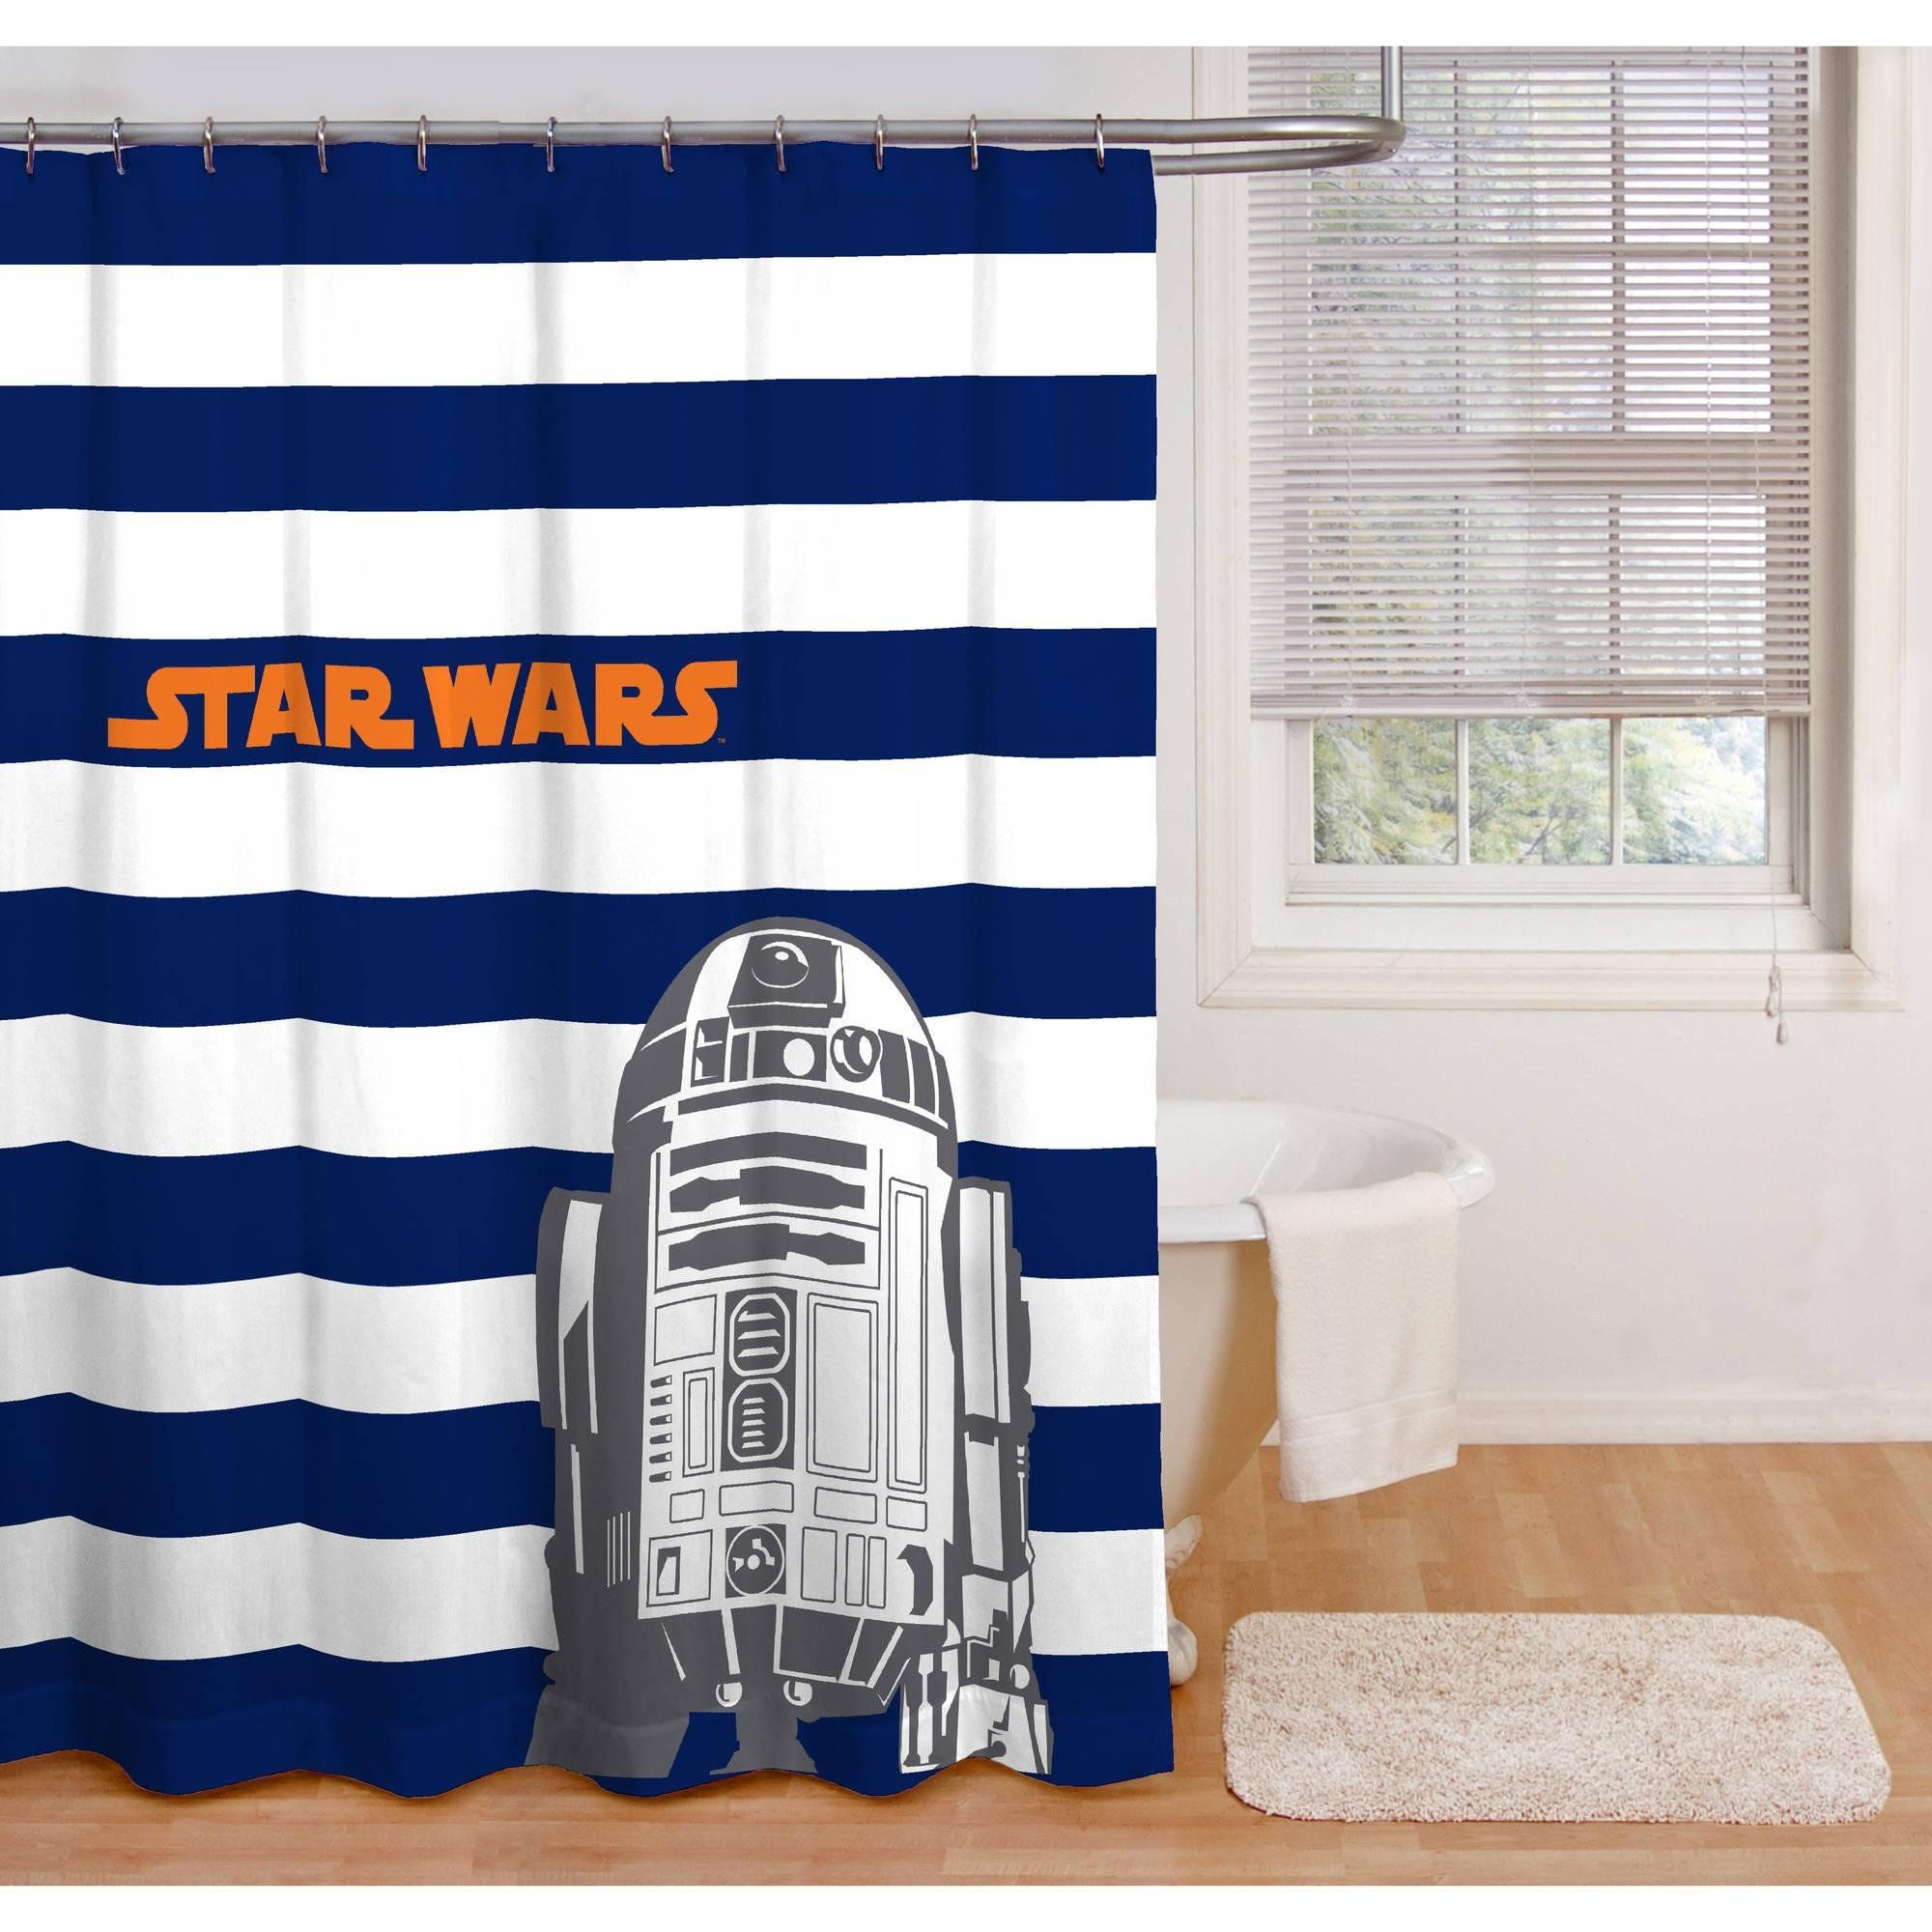 Amazon.com - Star Wars Large, Heavy Duty, Eco-Friendly R2D2 Non ...